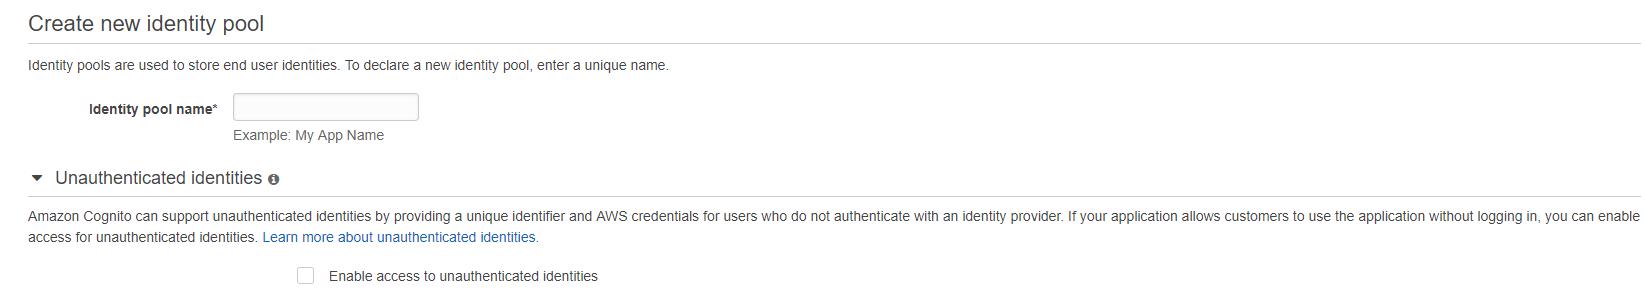 Federated Identity - Step 1